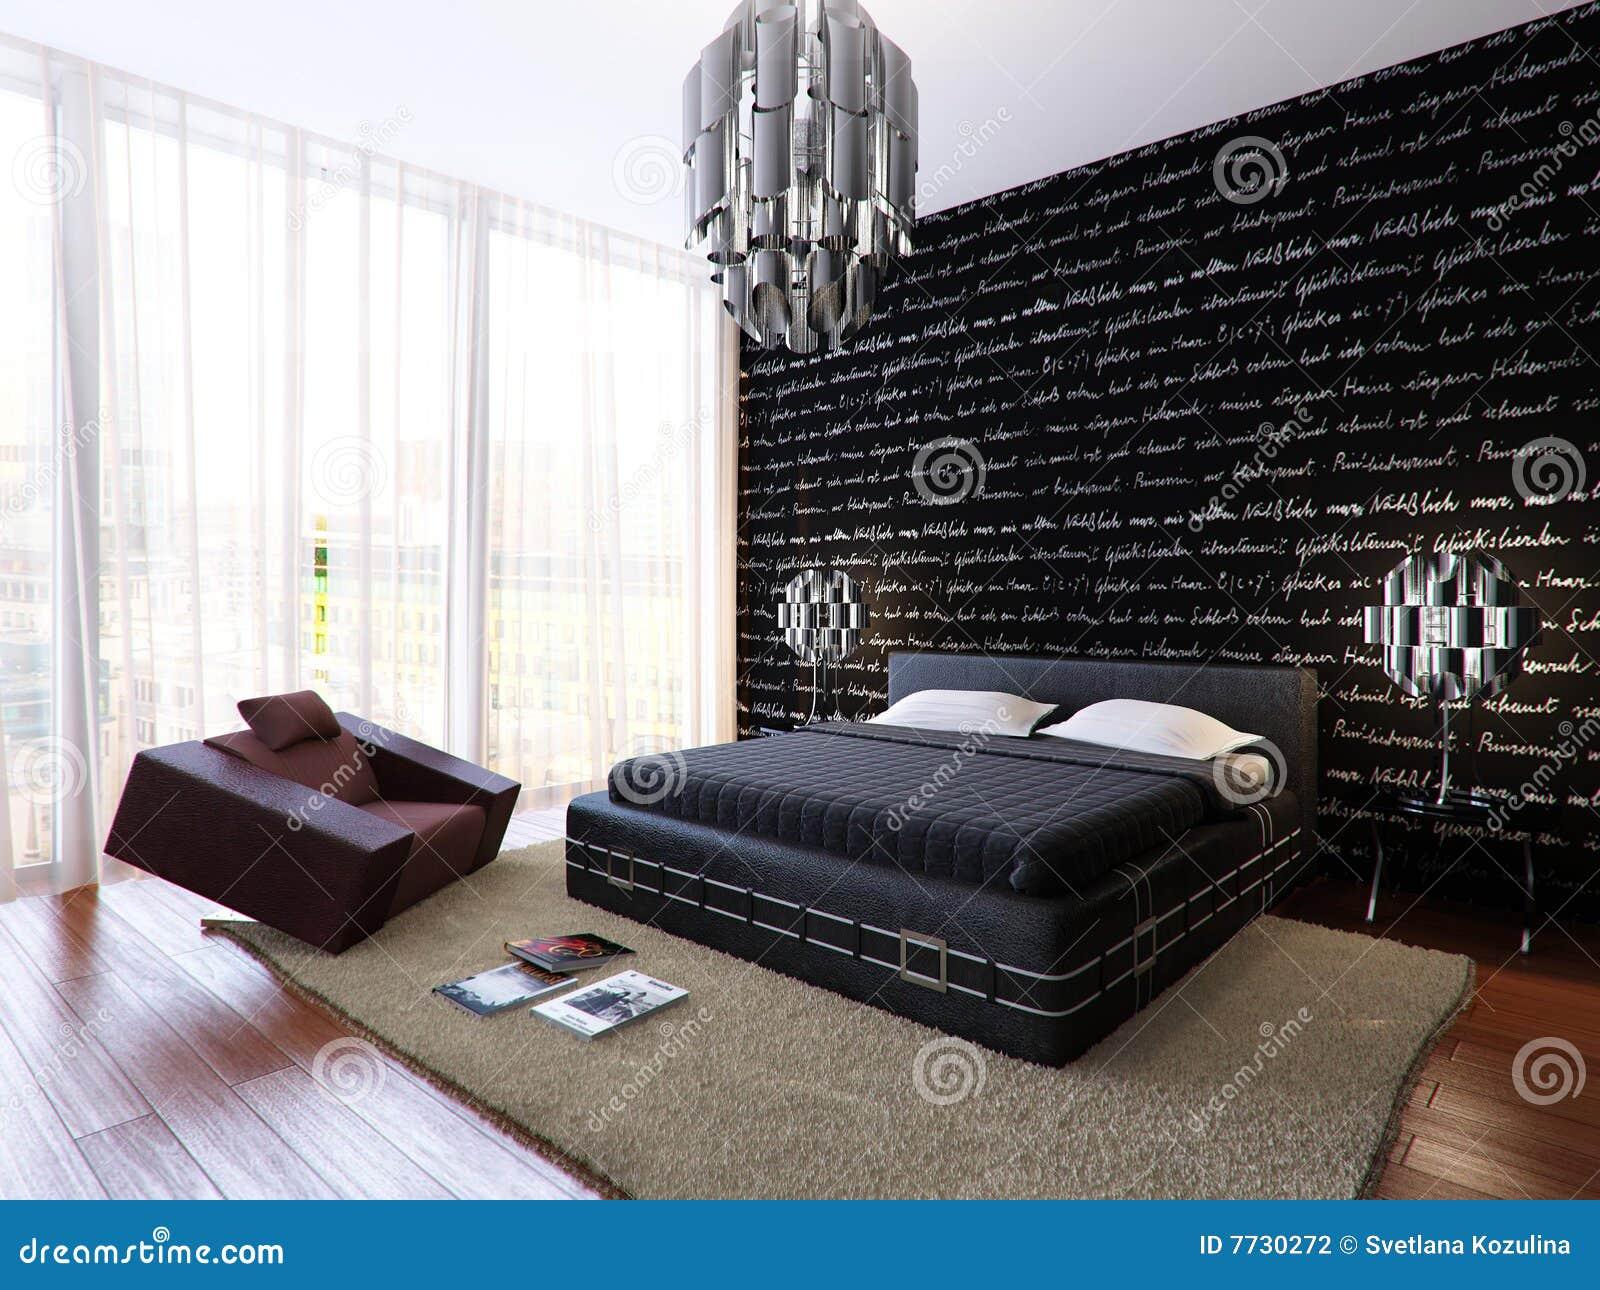 My sleeping room stock photography image 7730272 for Sleeping room design